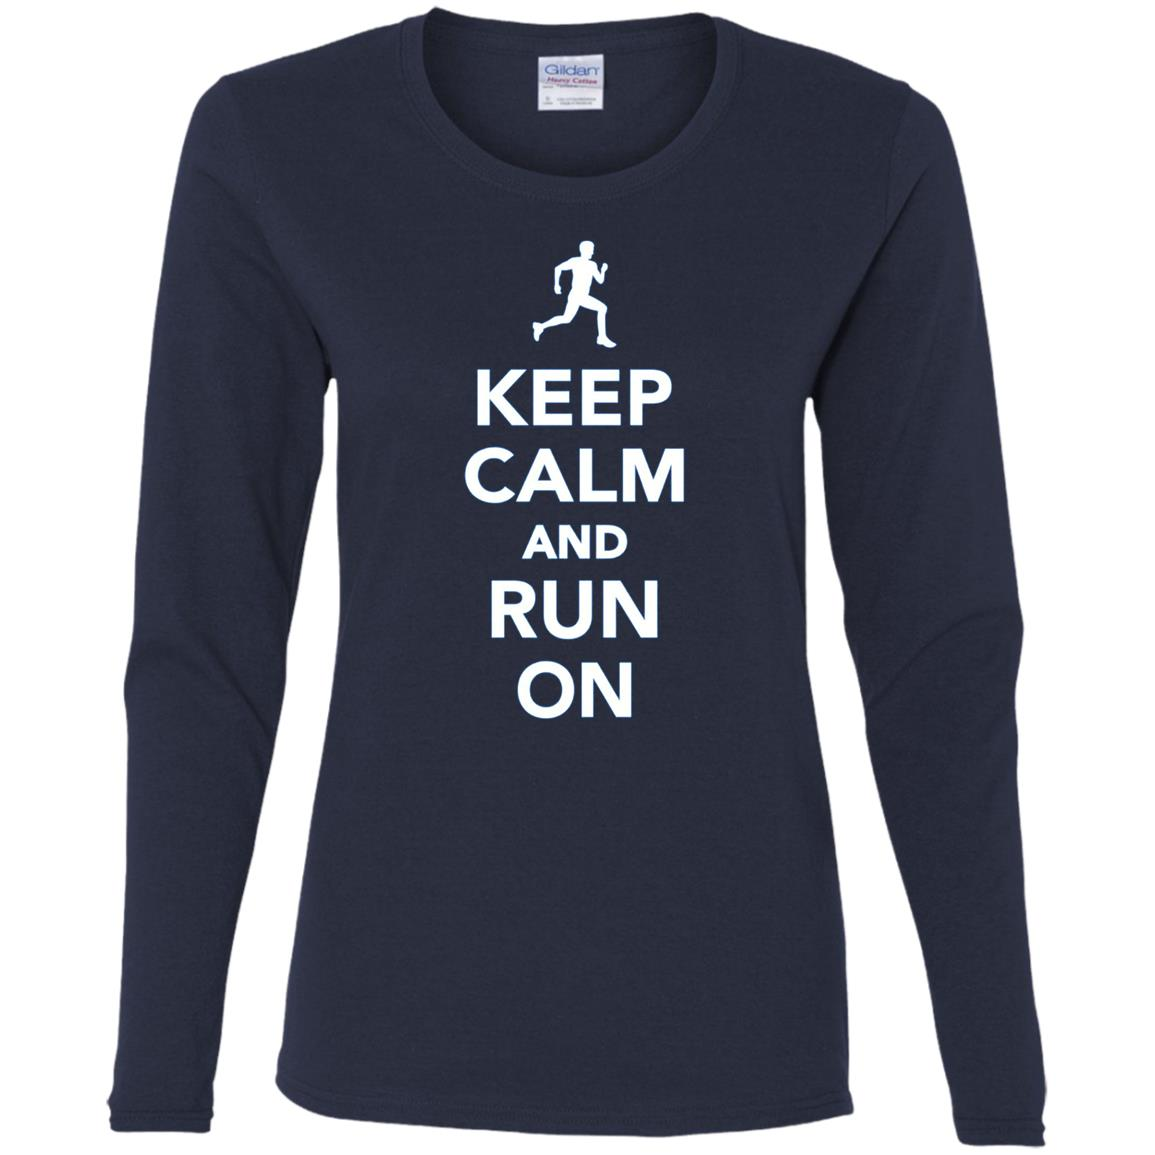 Keep calm and run on Women Long Sleeve T-Shirt